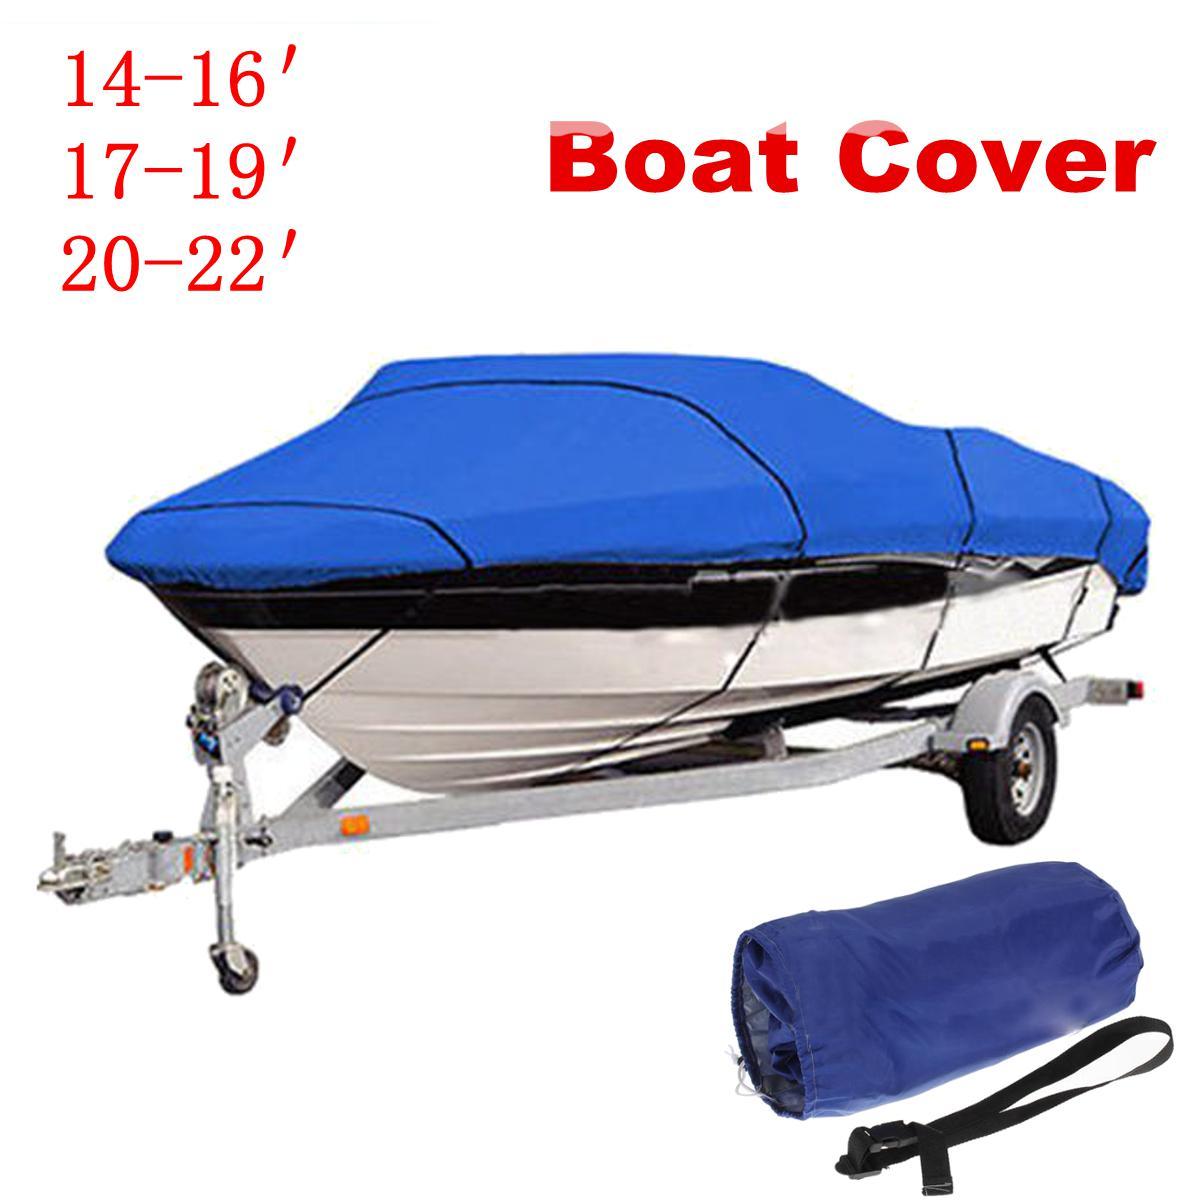 11-13 14-16 17-19 20-22ft Trailerable Fishing Ski Bass Boat Cover Waterproof US